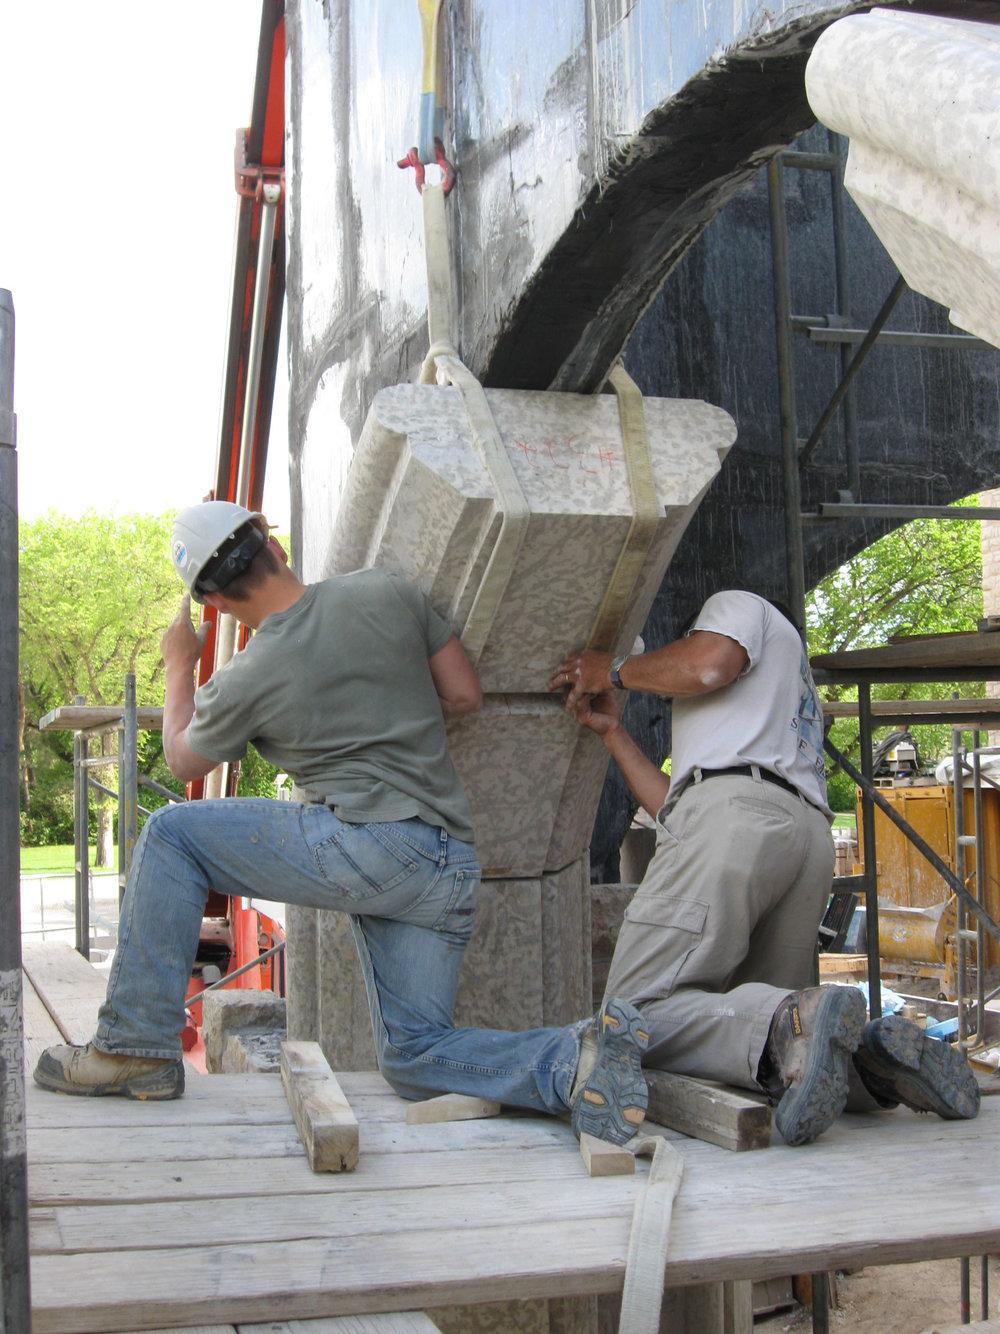 08S102 Josh Pelletier, Larry Mavuiex-Web.jpg